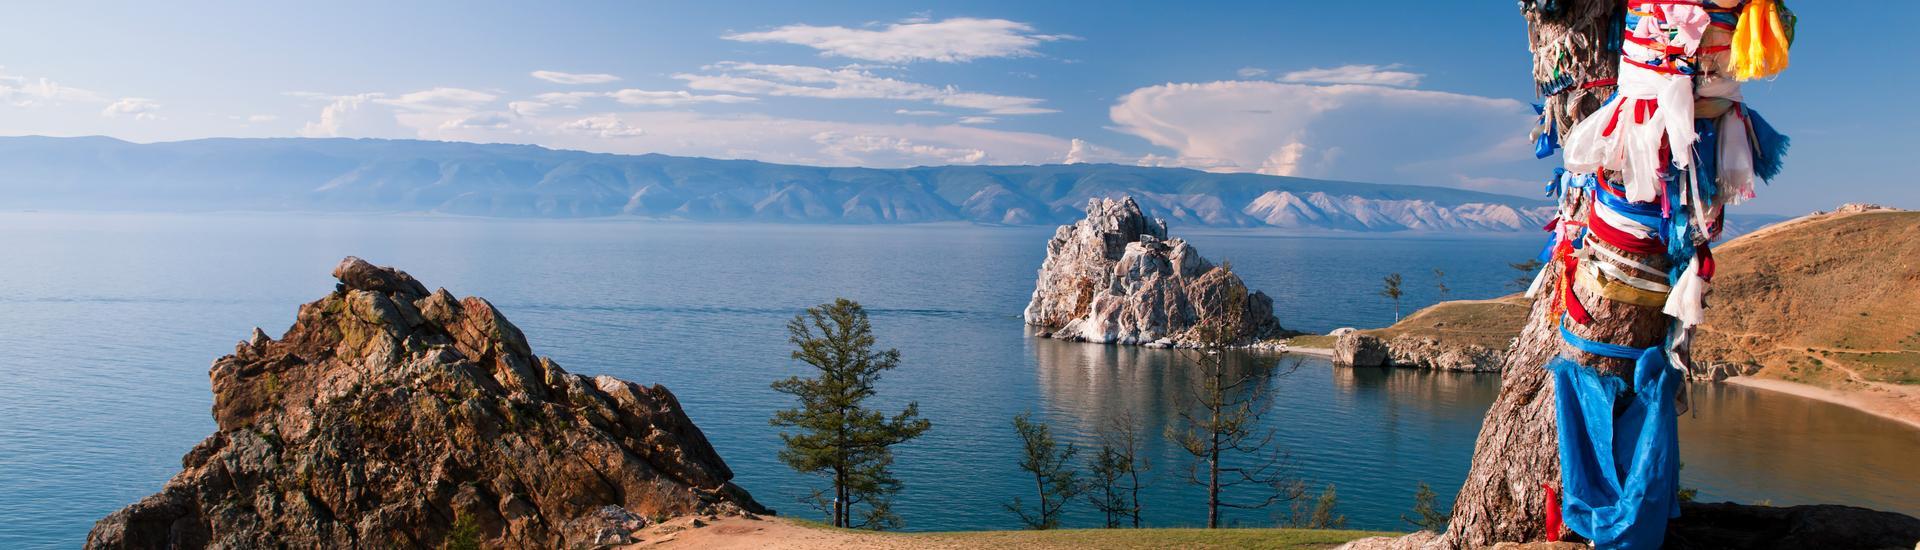 Bajkał - błękitna perła Syberii